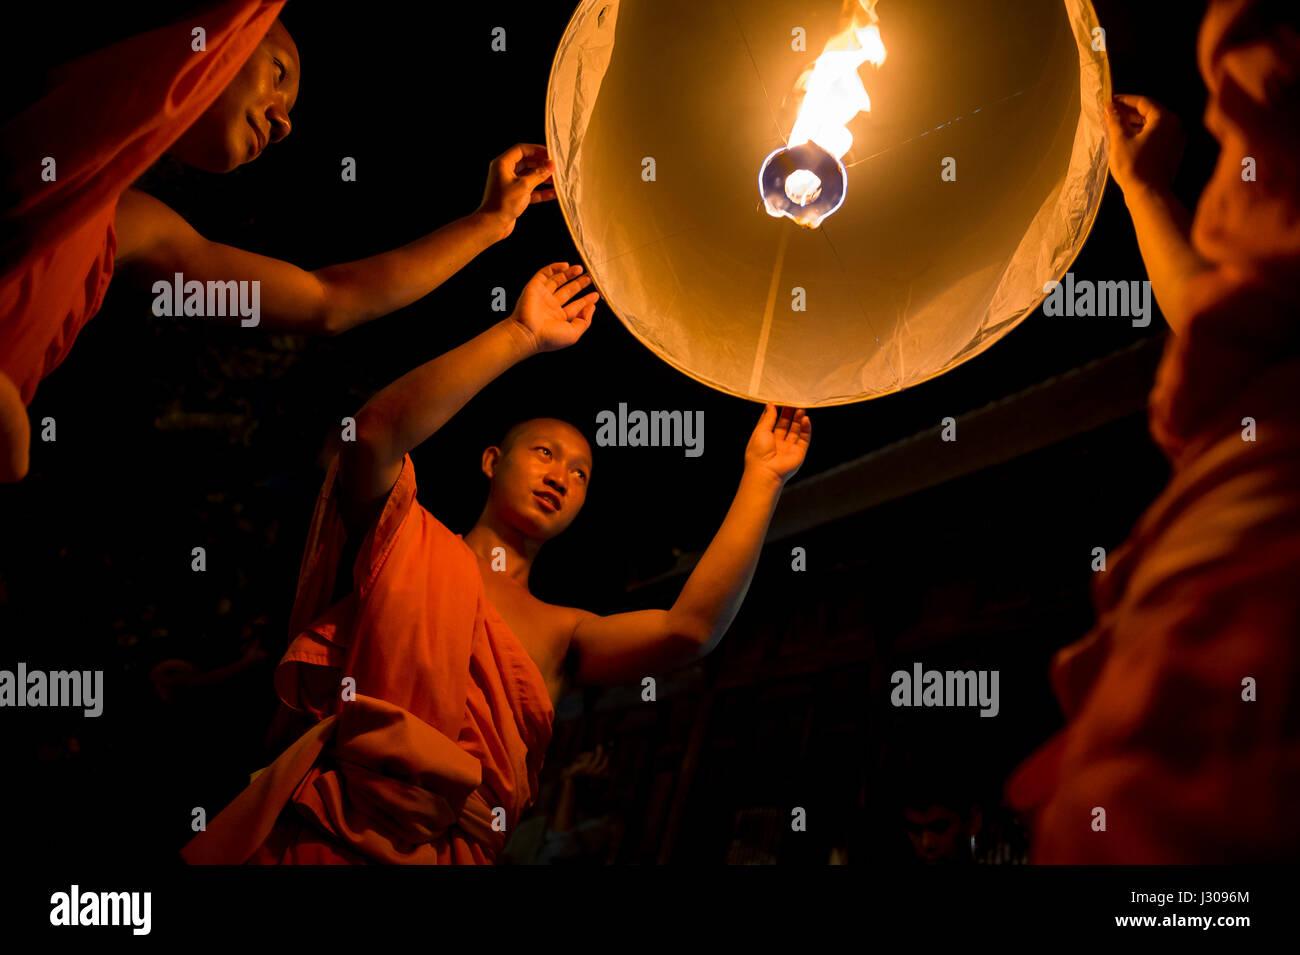 CHIANG MAI, THAÏLANDE - 7 NOVEMBRE 2014: les jeunes moines bouddhistes en robe orange lancer sky lanternes Photo Stock